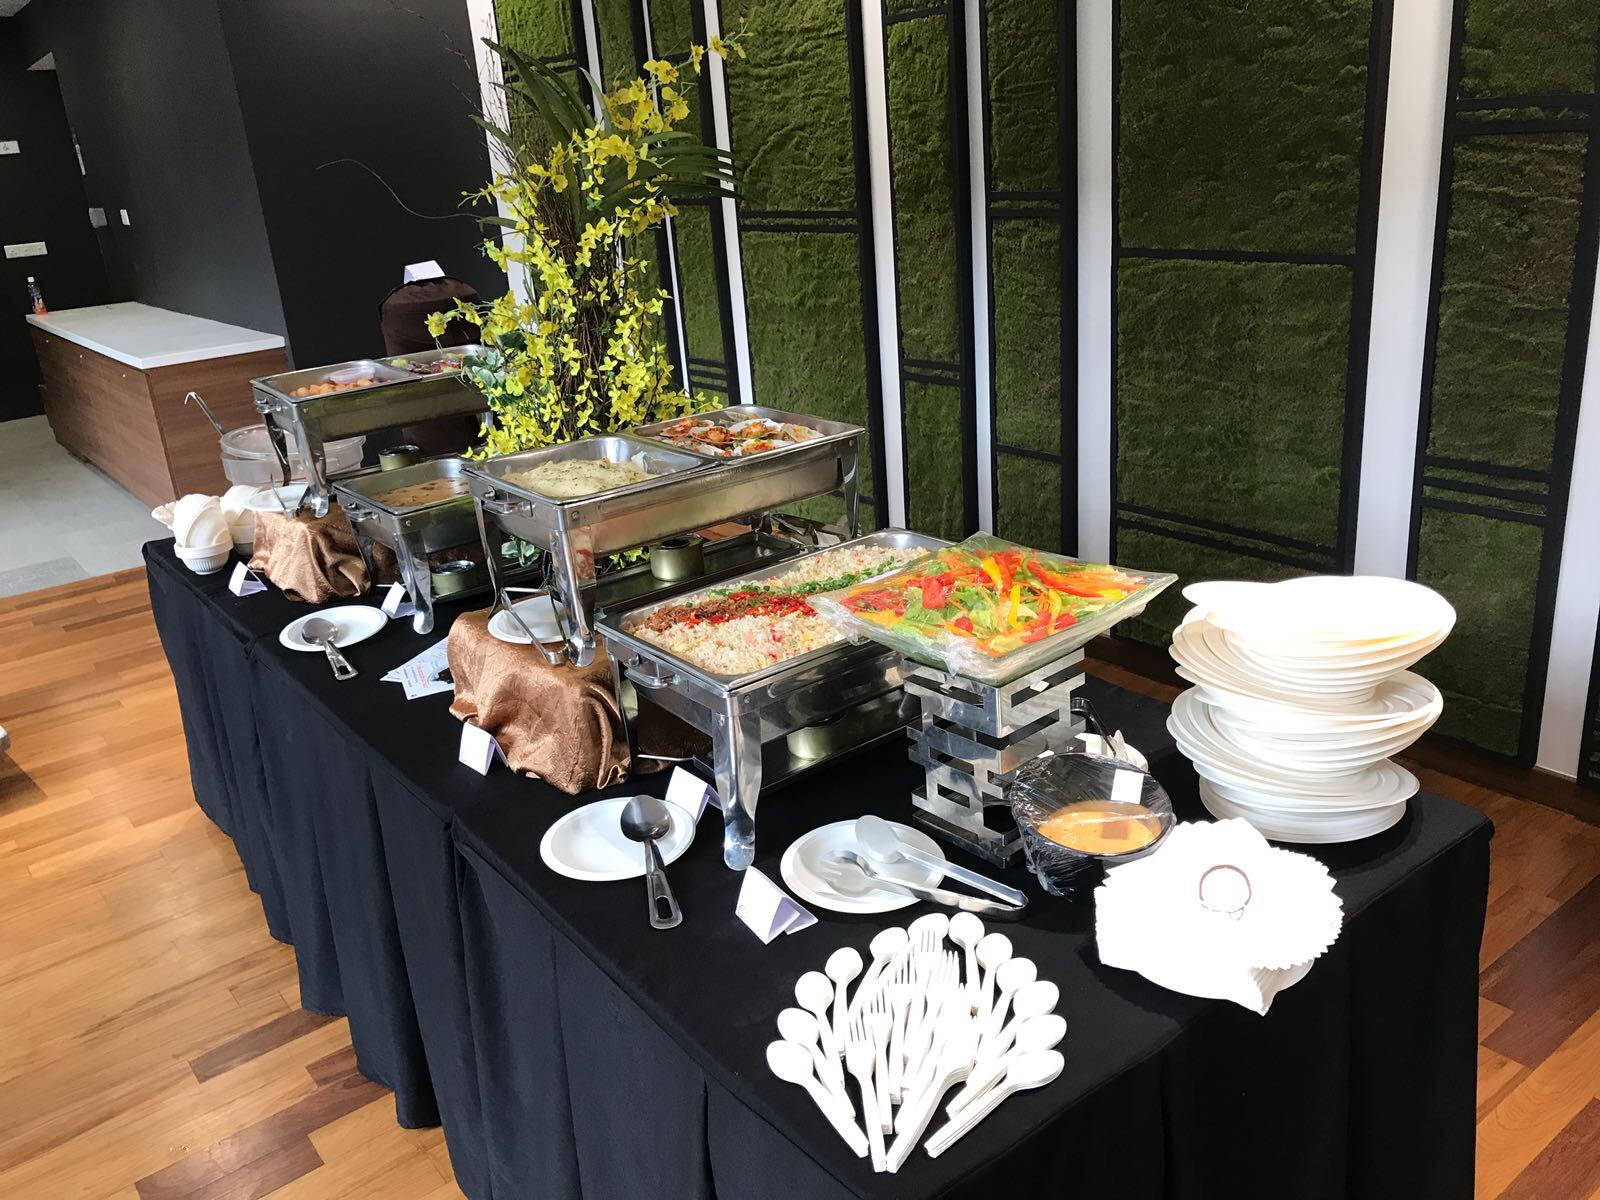 Phenomenal Chu Yi Kitchen Best Price Guaranteed At Foodline Sg Interior Design Ideas Gentotryabchikinfo